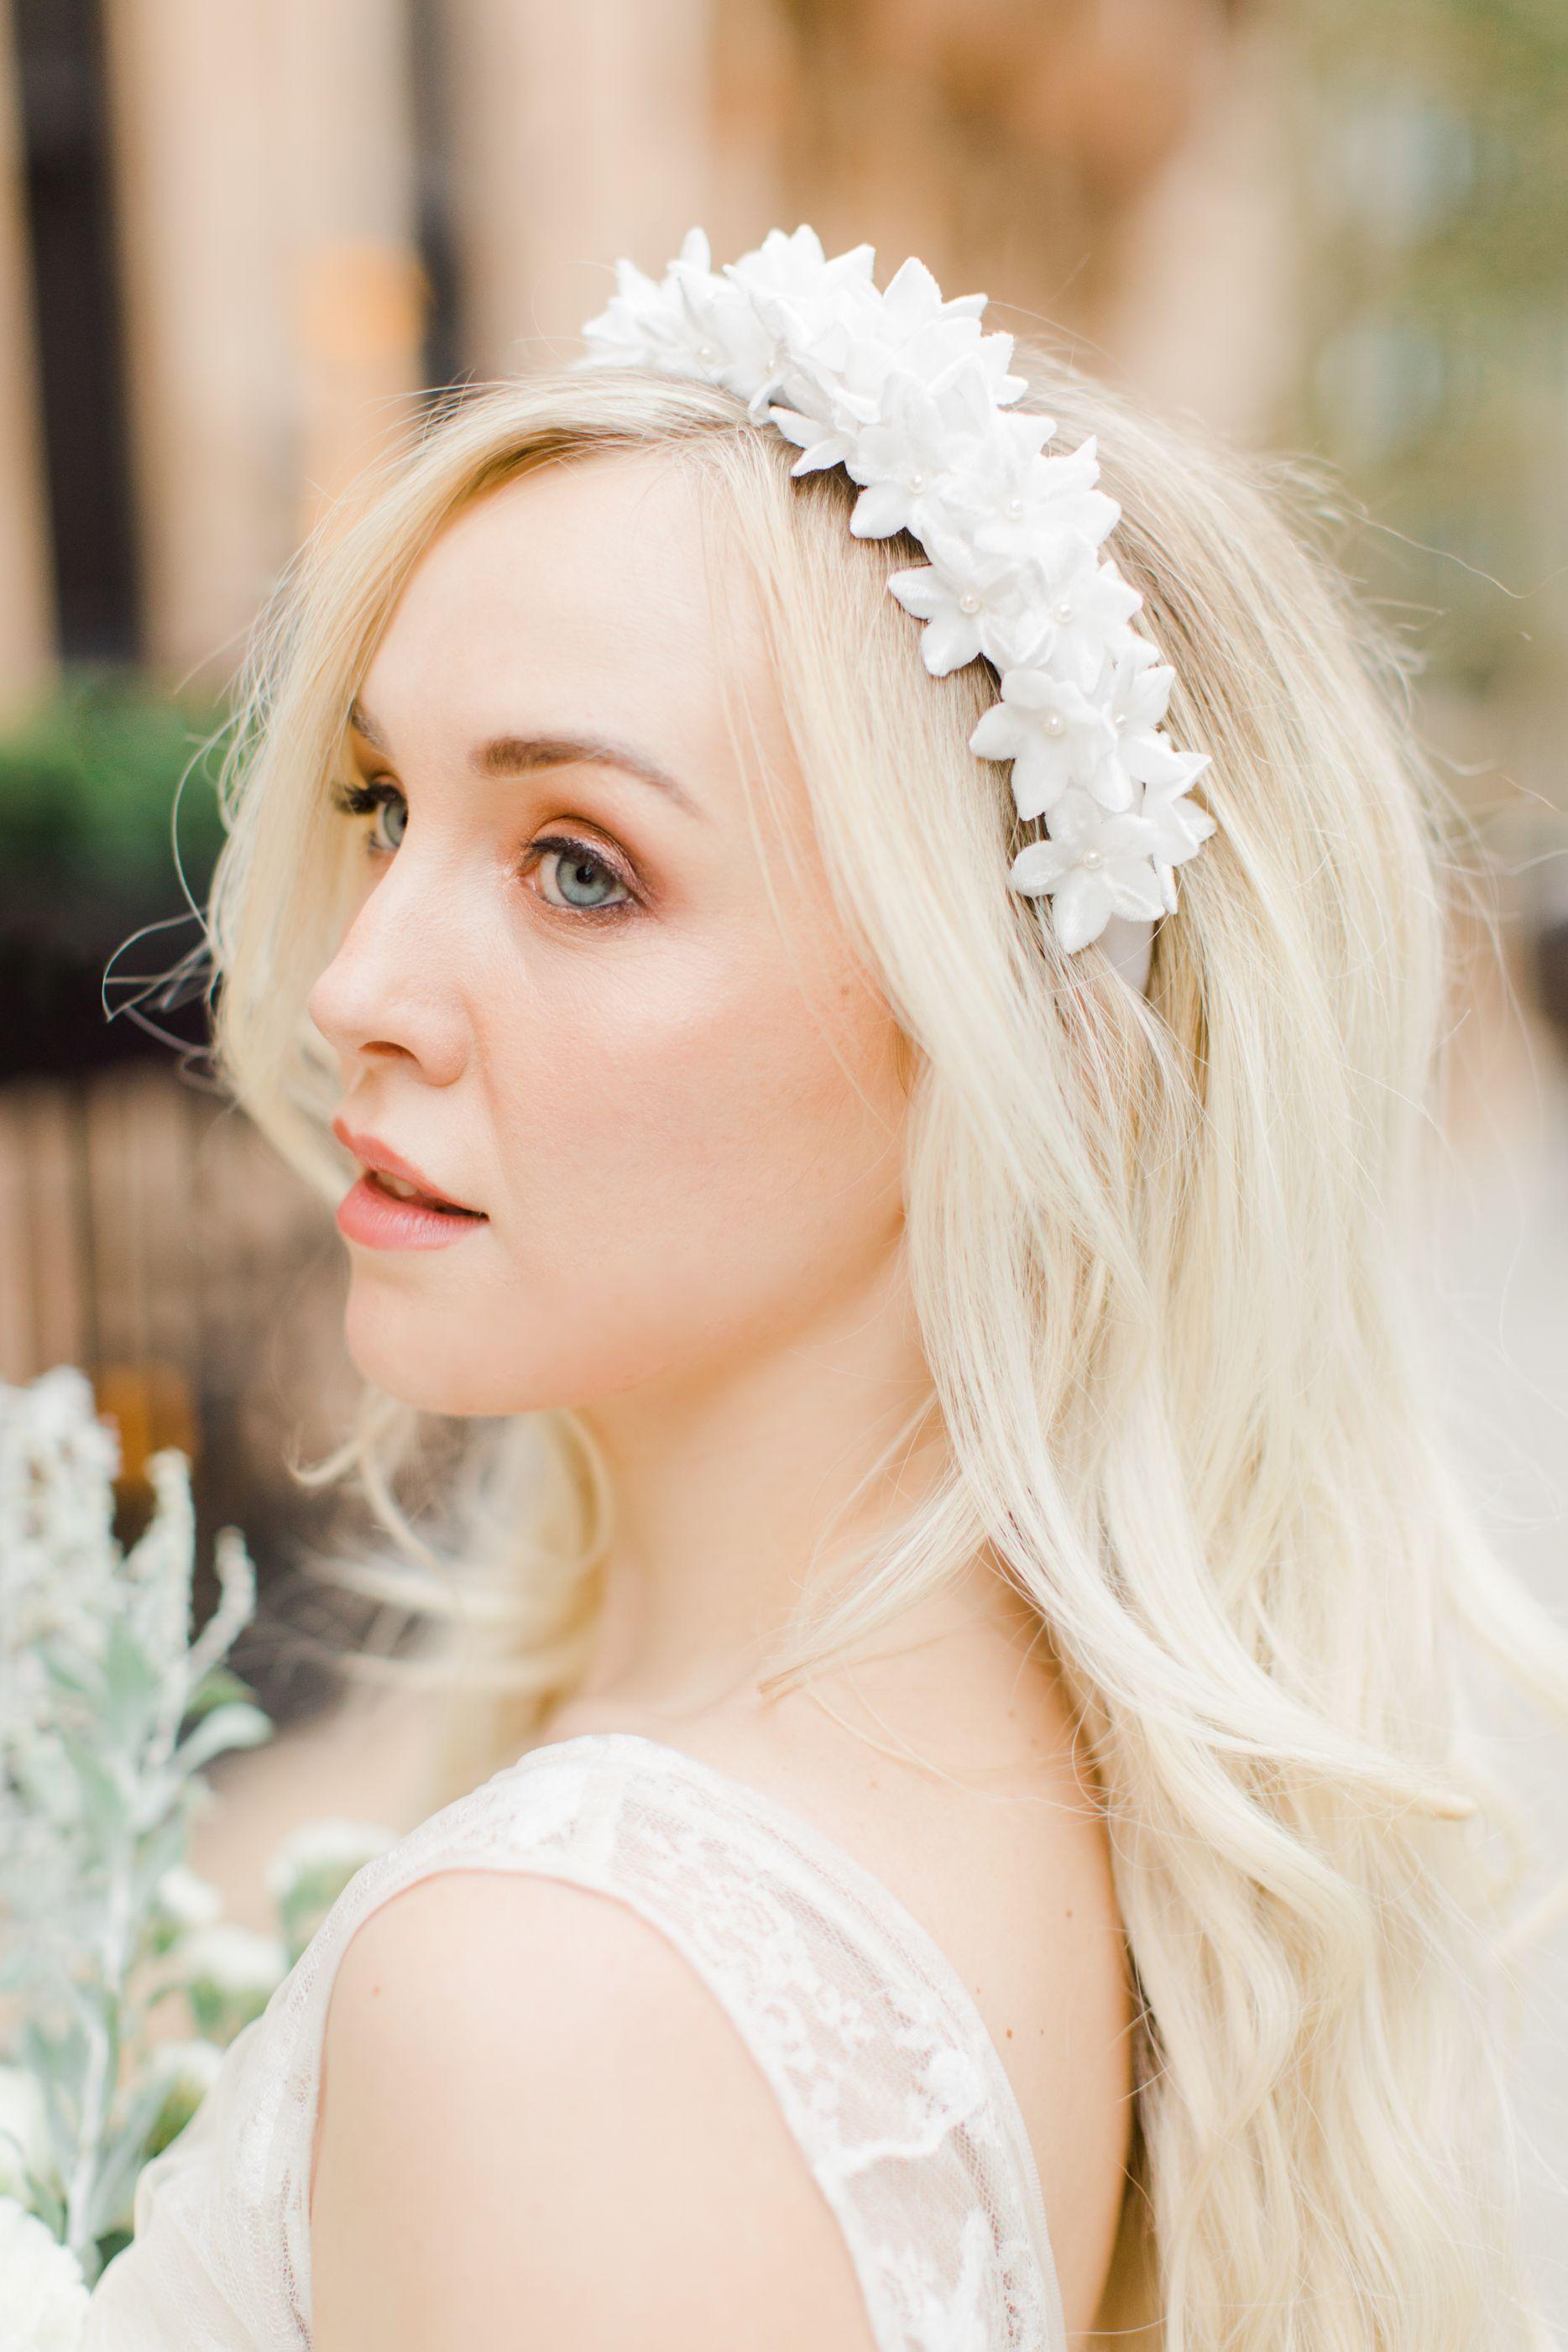 rachel sokhal bridal accessories jessica headpiece   couture collection